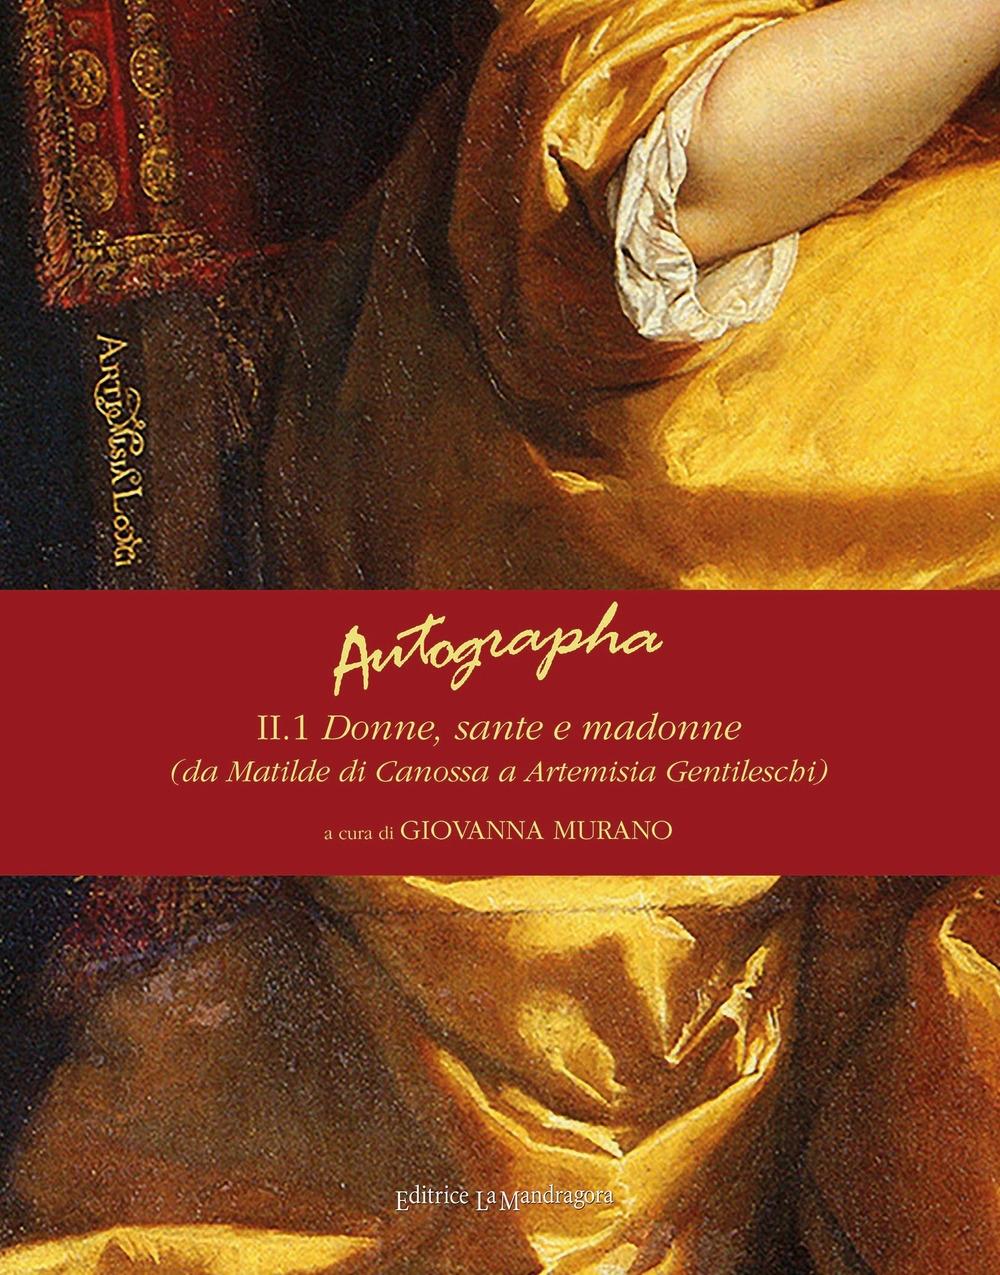 Autographa. Vol. 2/1: Donne, sante e madonne (da Matilde di Canossa ad Artemisia Gentileschi)